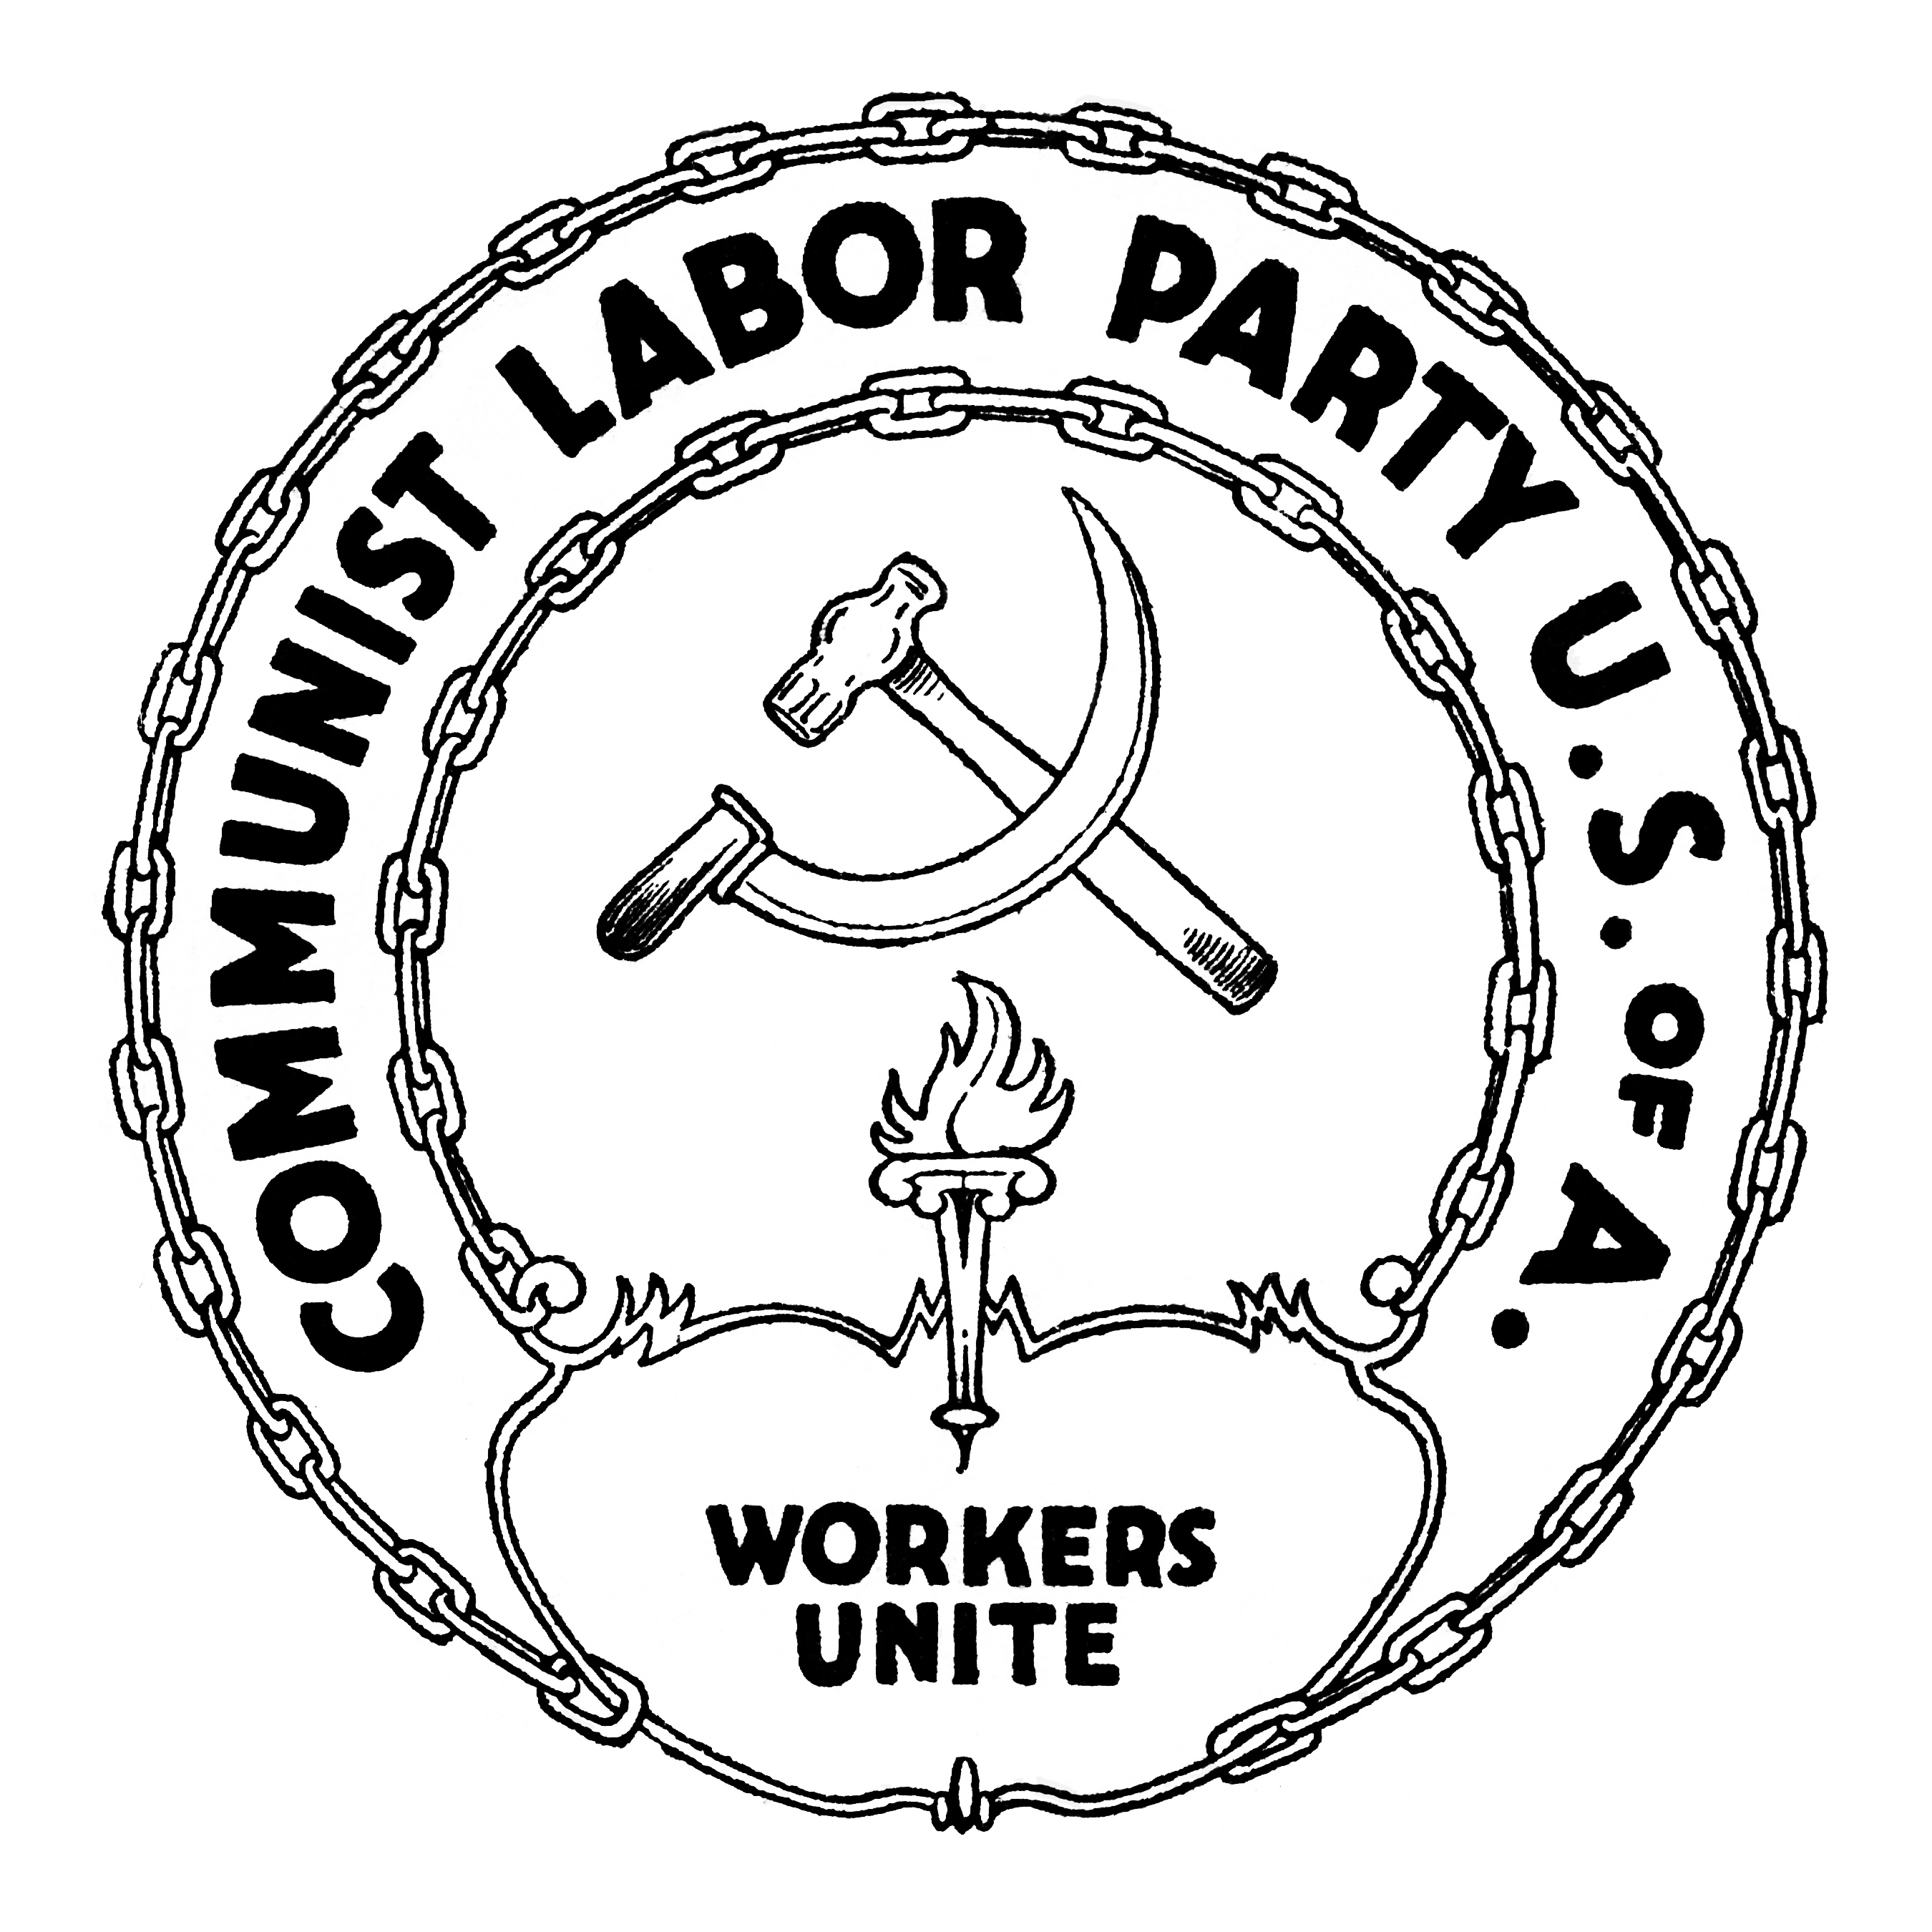 communist labor party of america - wikipedia